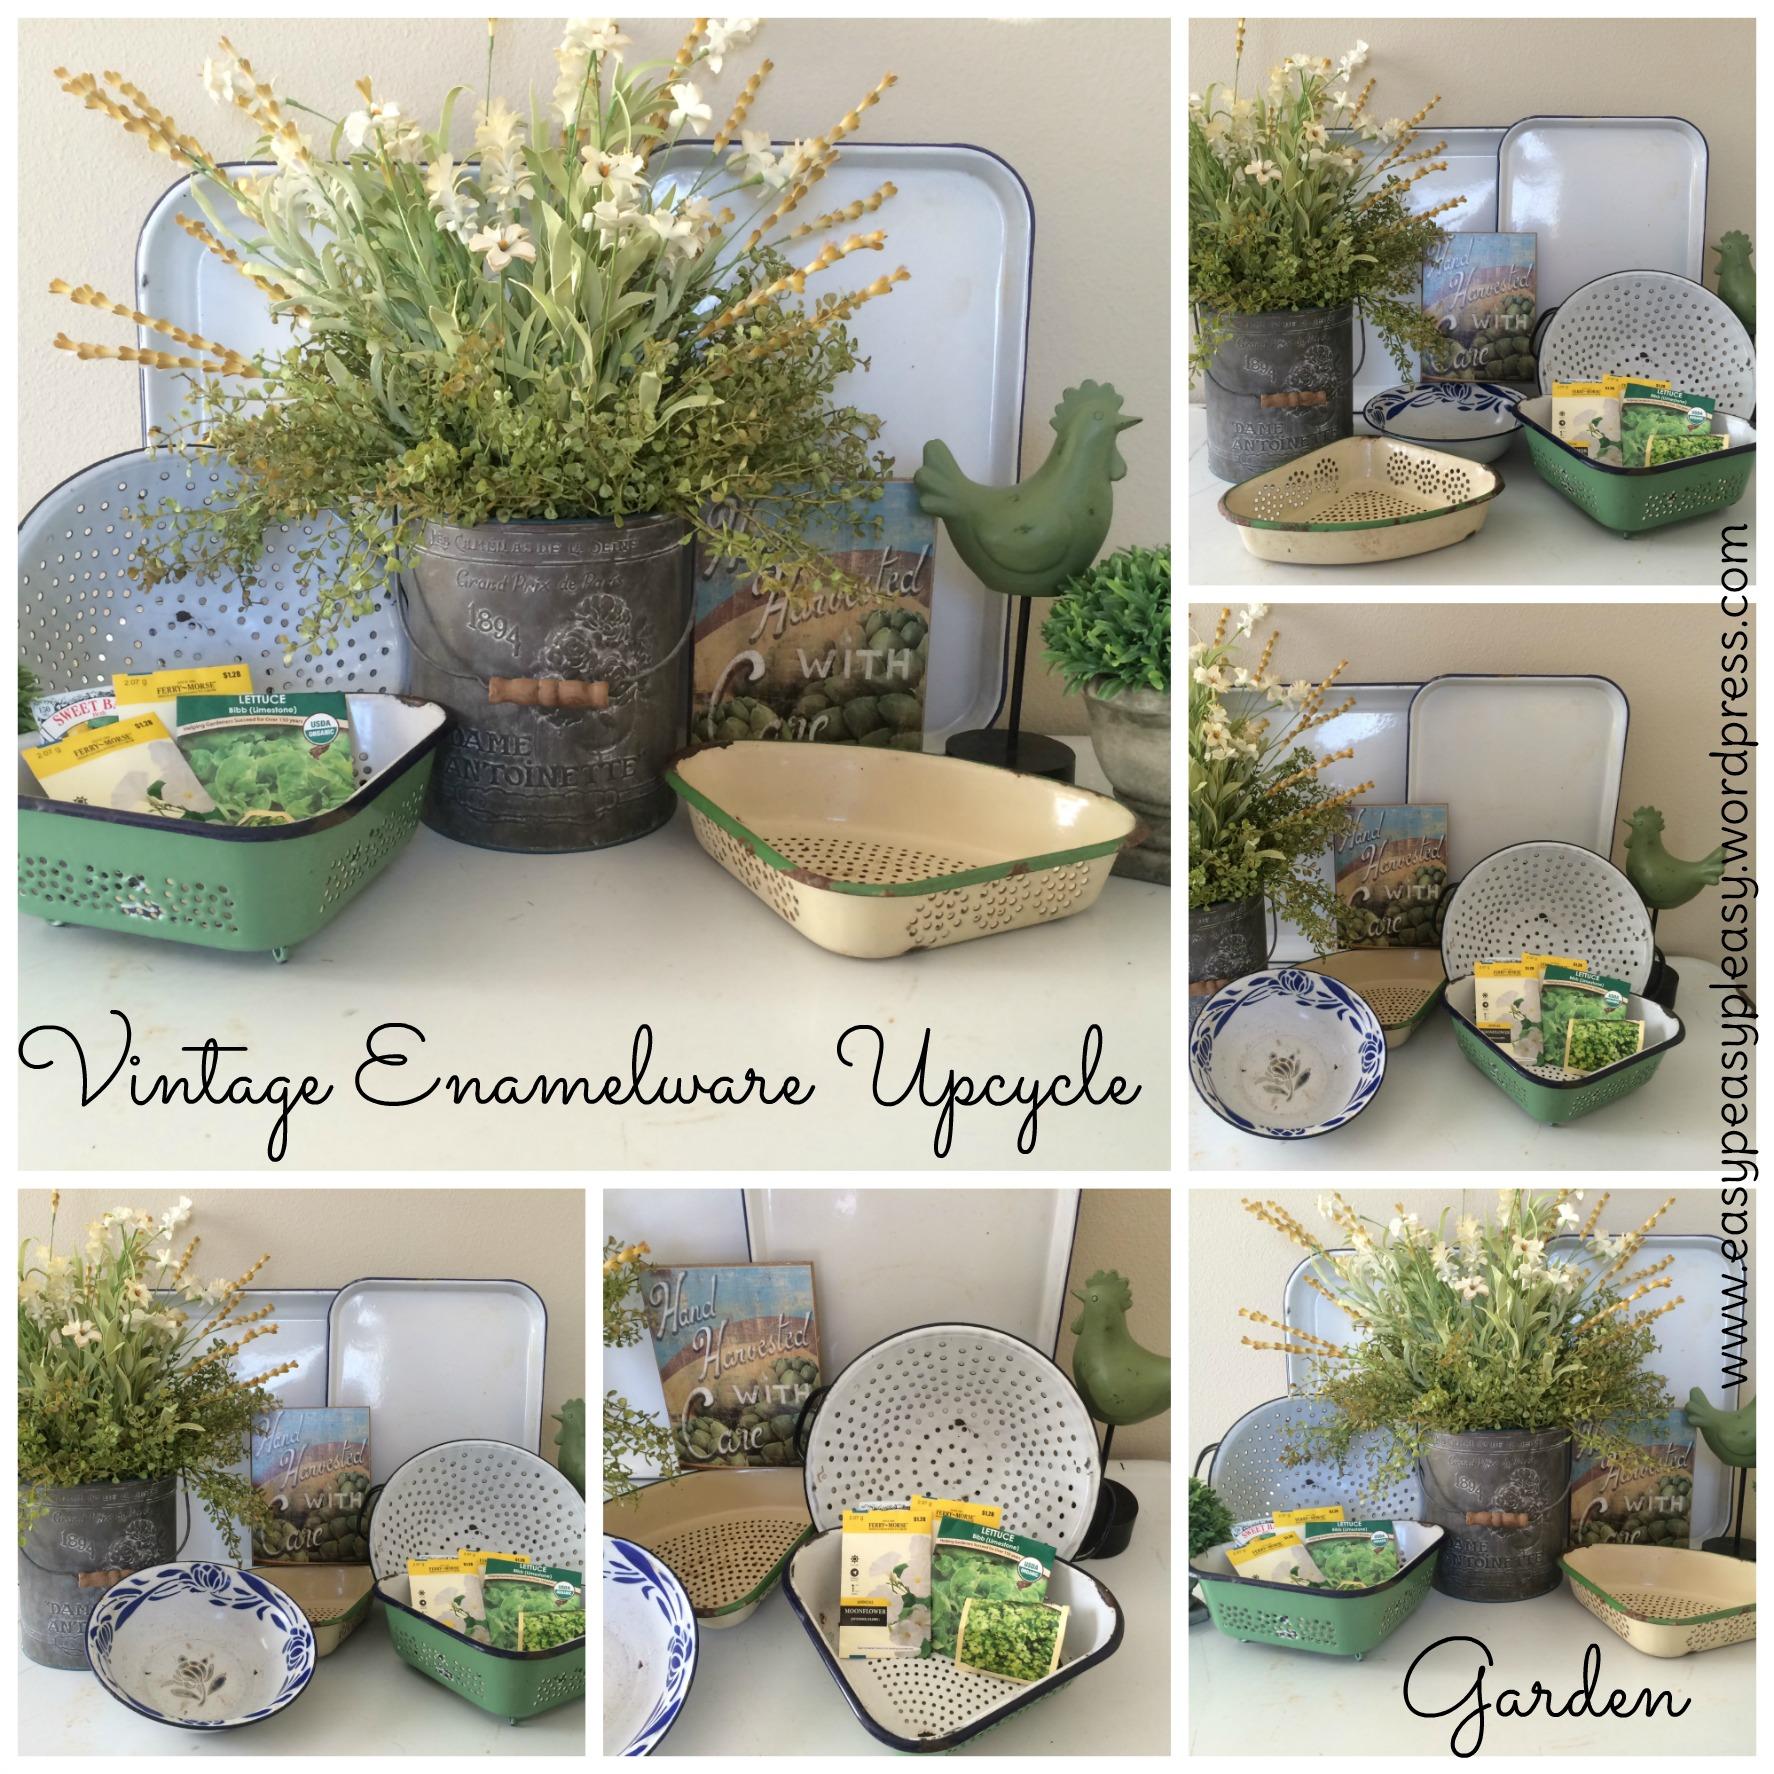 Vintage Enamelware Garden Upcycle Ideas at https://easypeasypleasy.com